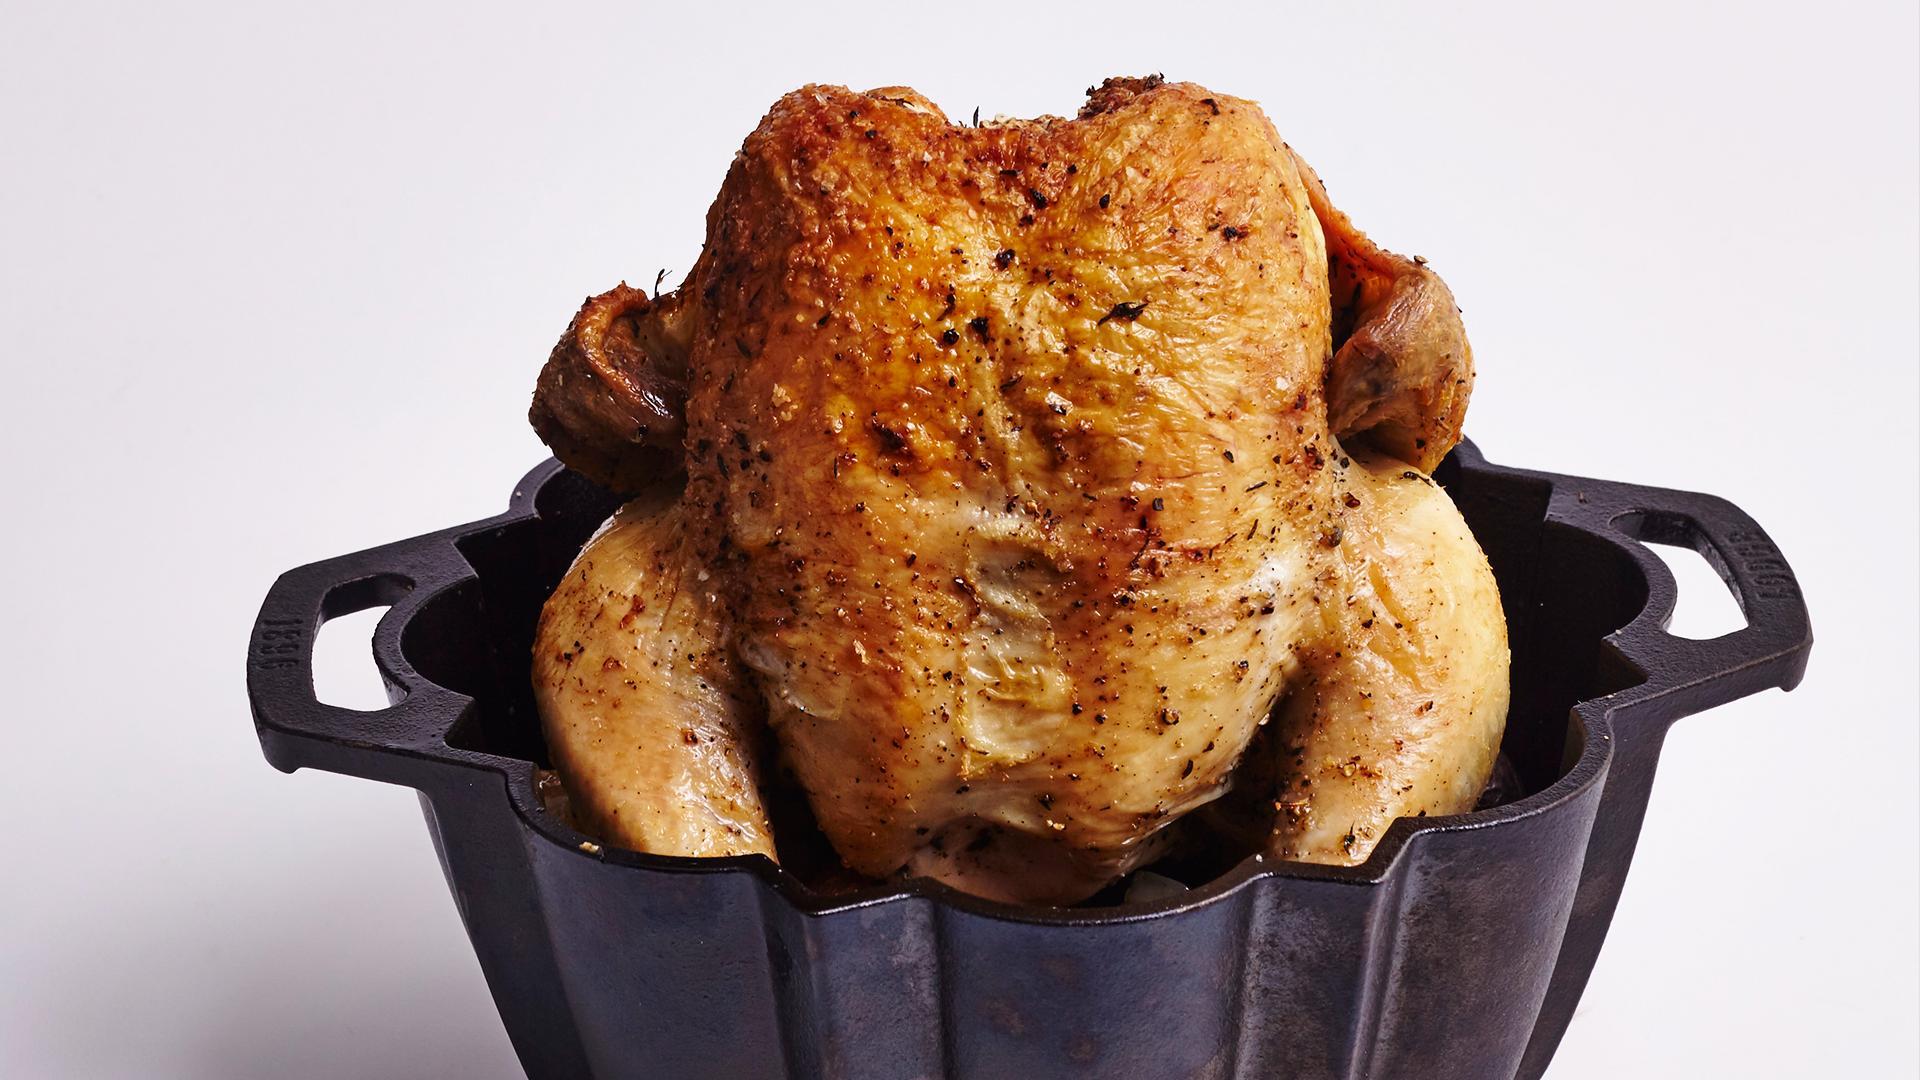 Bundt Pan Roasted Chicken Dinner Recipe Myrecipes,Granite Top Kitchen Island On Wheels